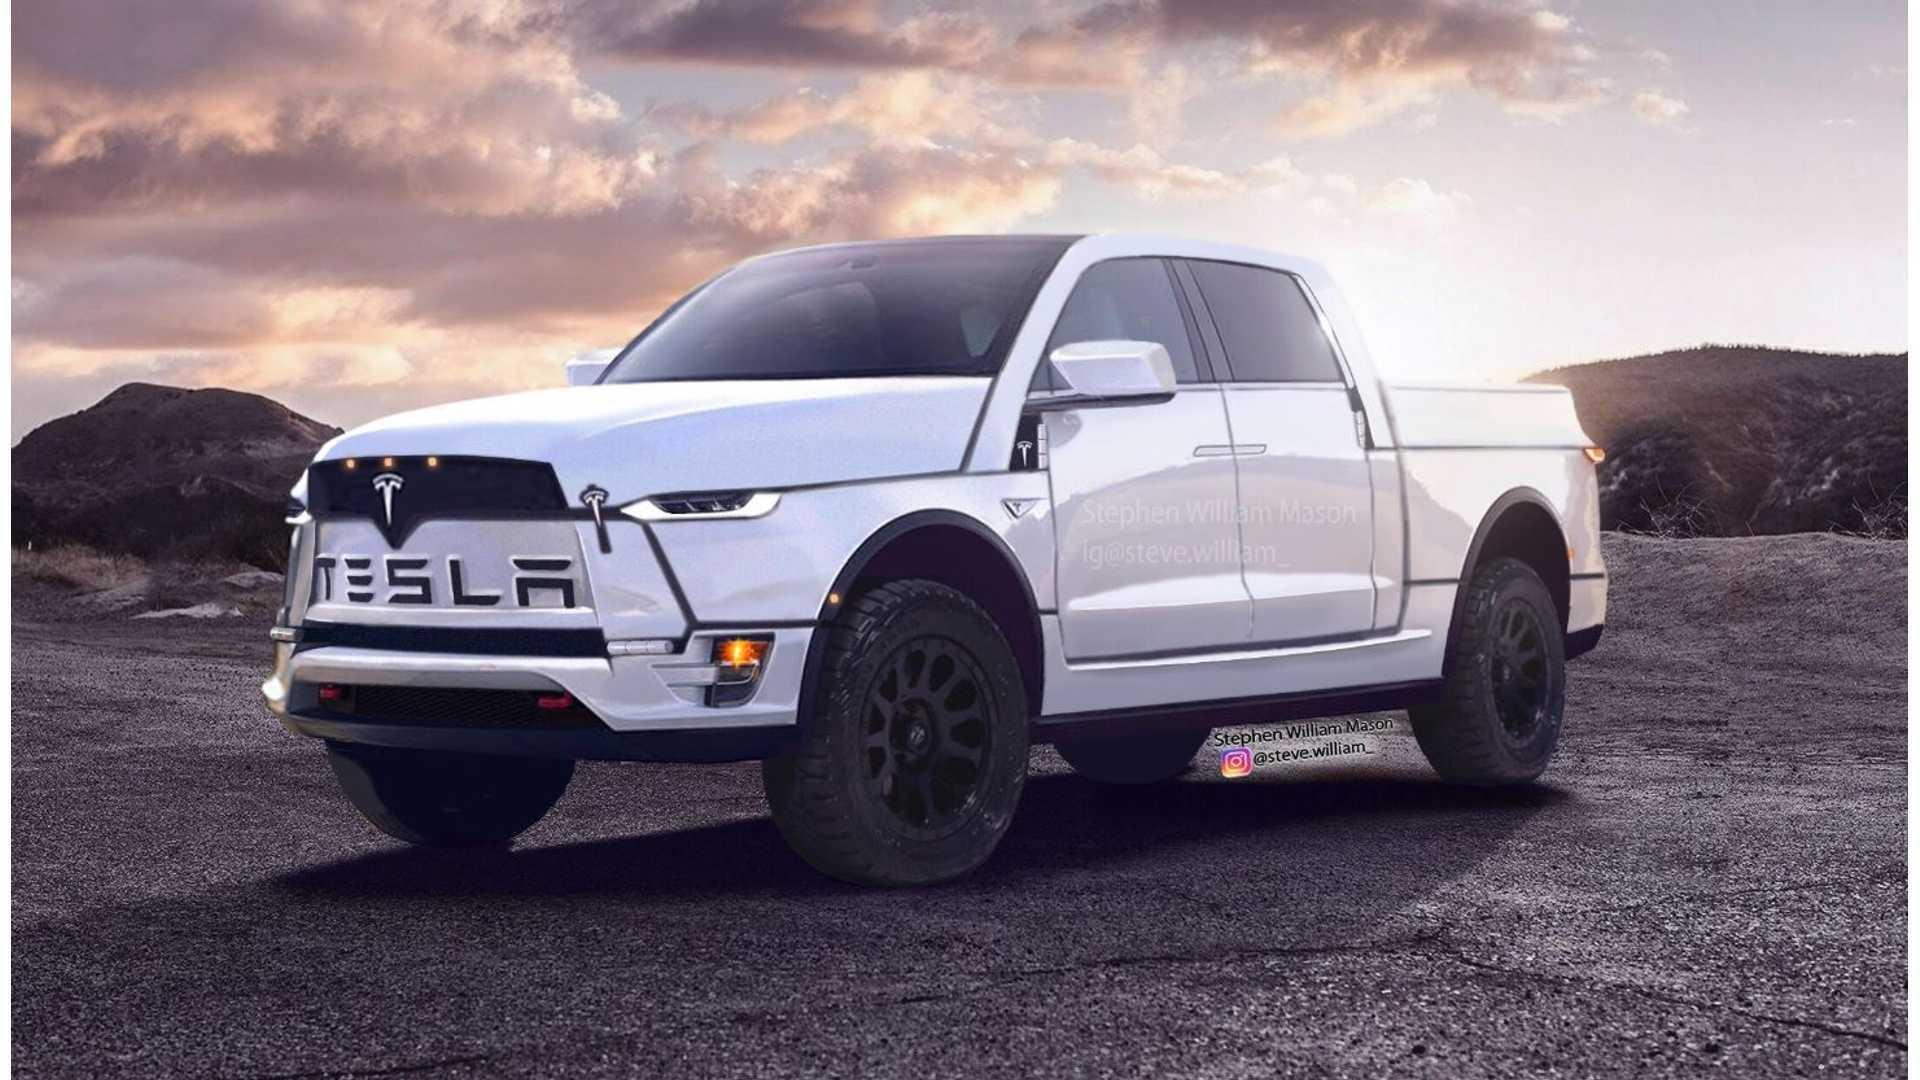 Tesla Pickup Truck To Be Priced Below 50 000 Makes Ram Seem Puny